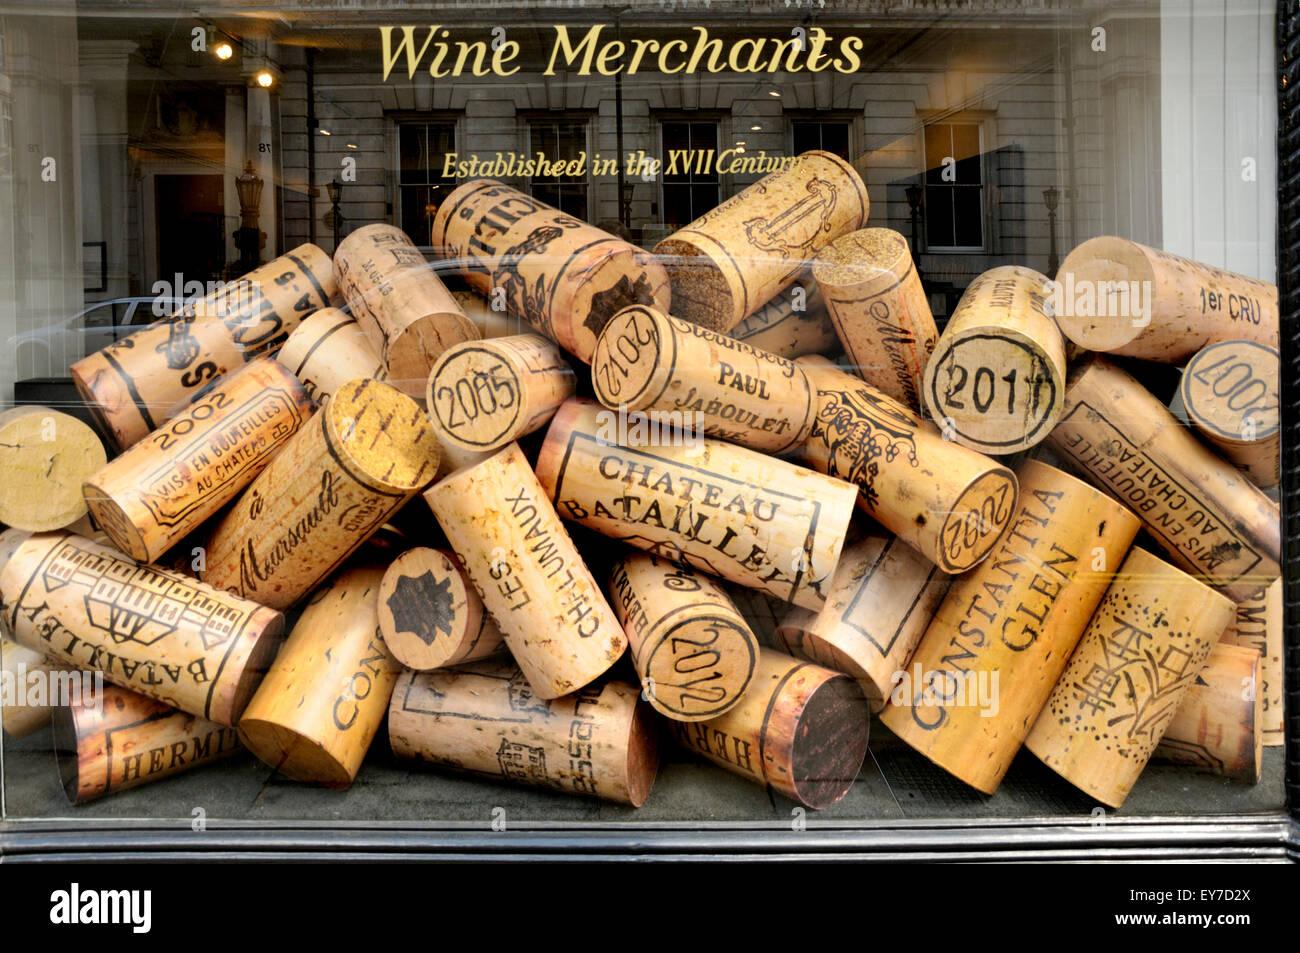 London, England, UK. Huge corks in the window of a wine merchant, Berry Bros & Rudd Ltd, 3 St James's St Stock Photo